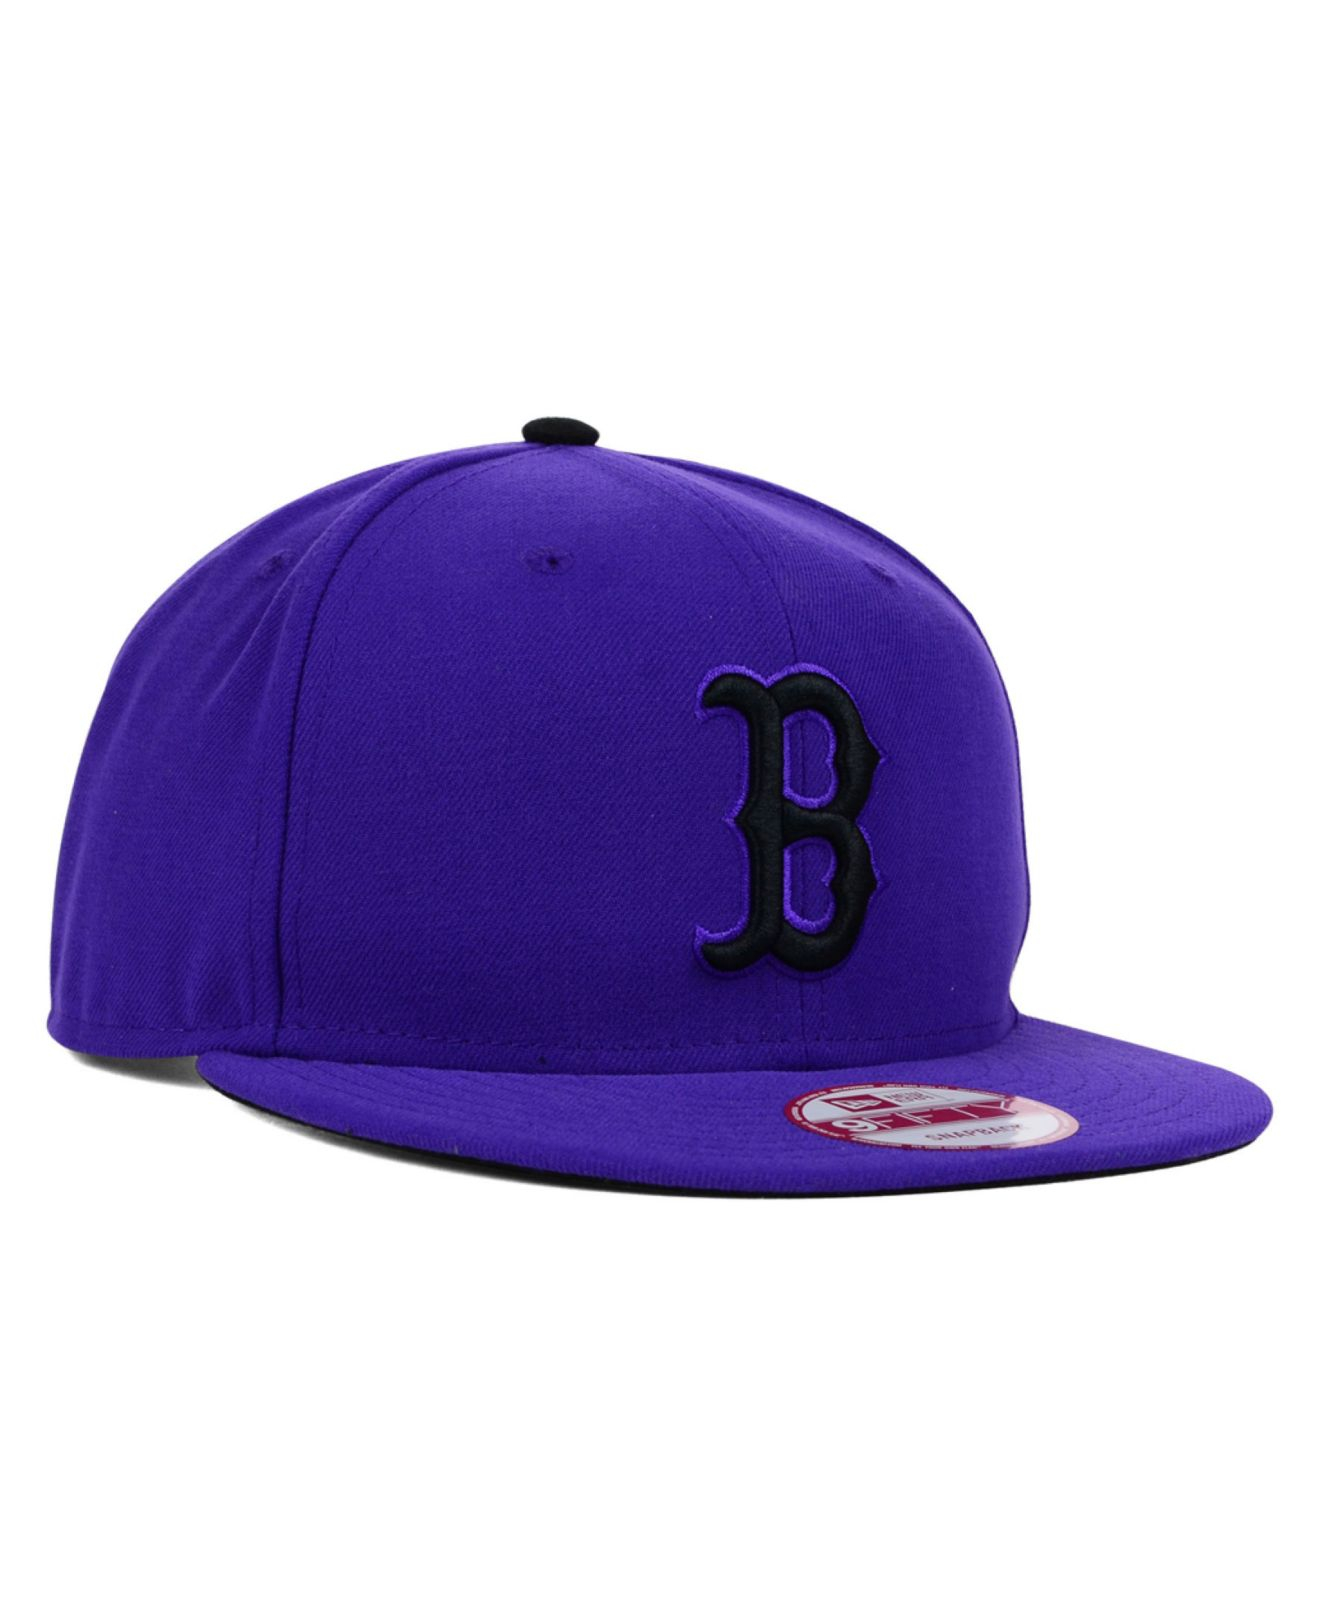 Lyst - KTZ Boston Red Sox Snap-Dub 9Fifty Snapback Cap in Purple for Men 785932a25700